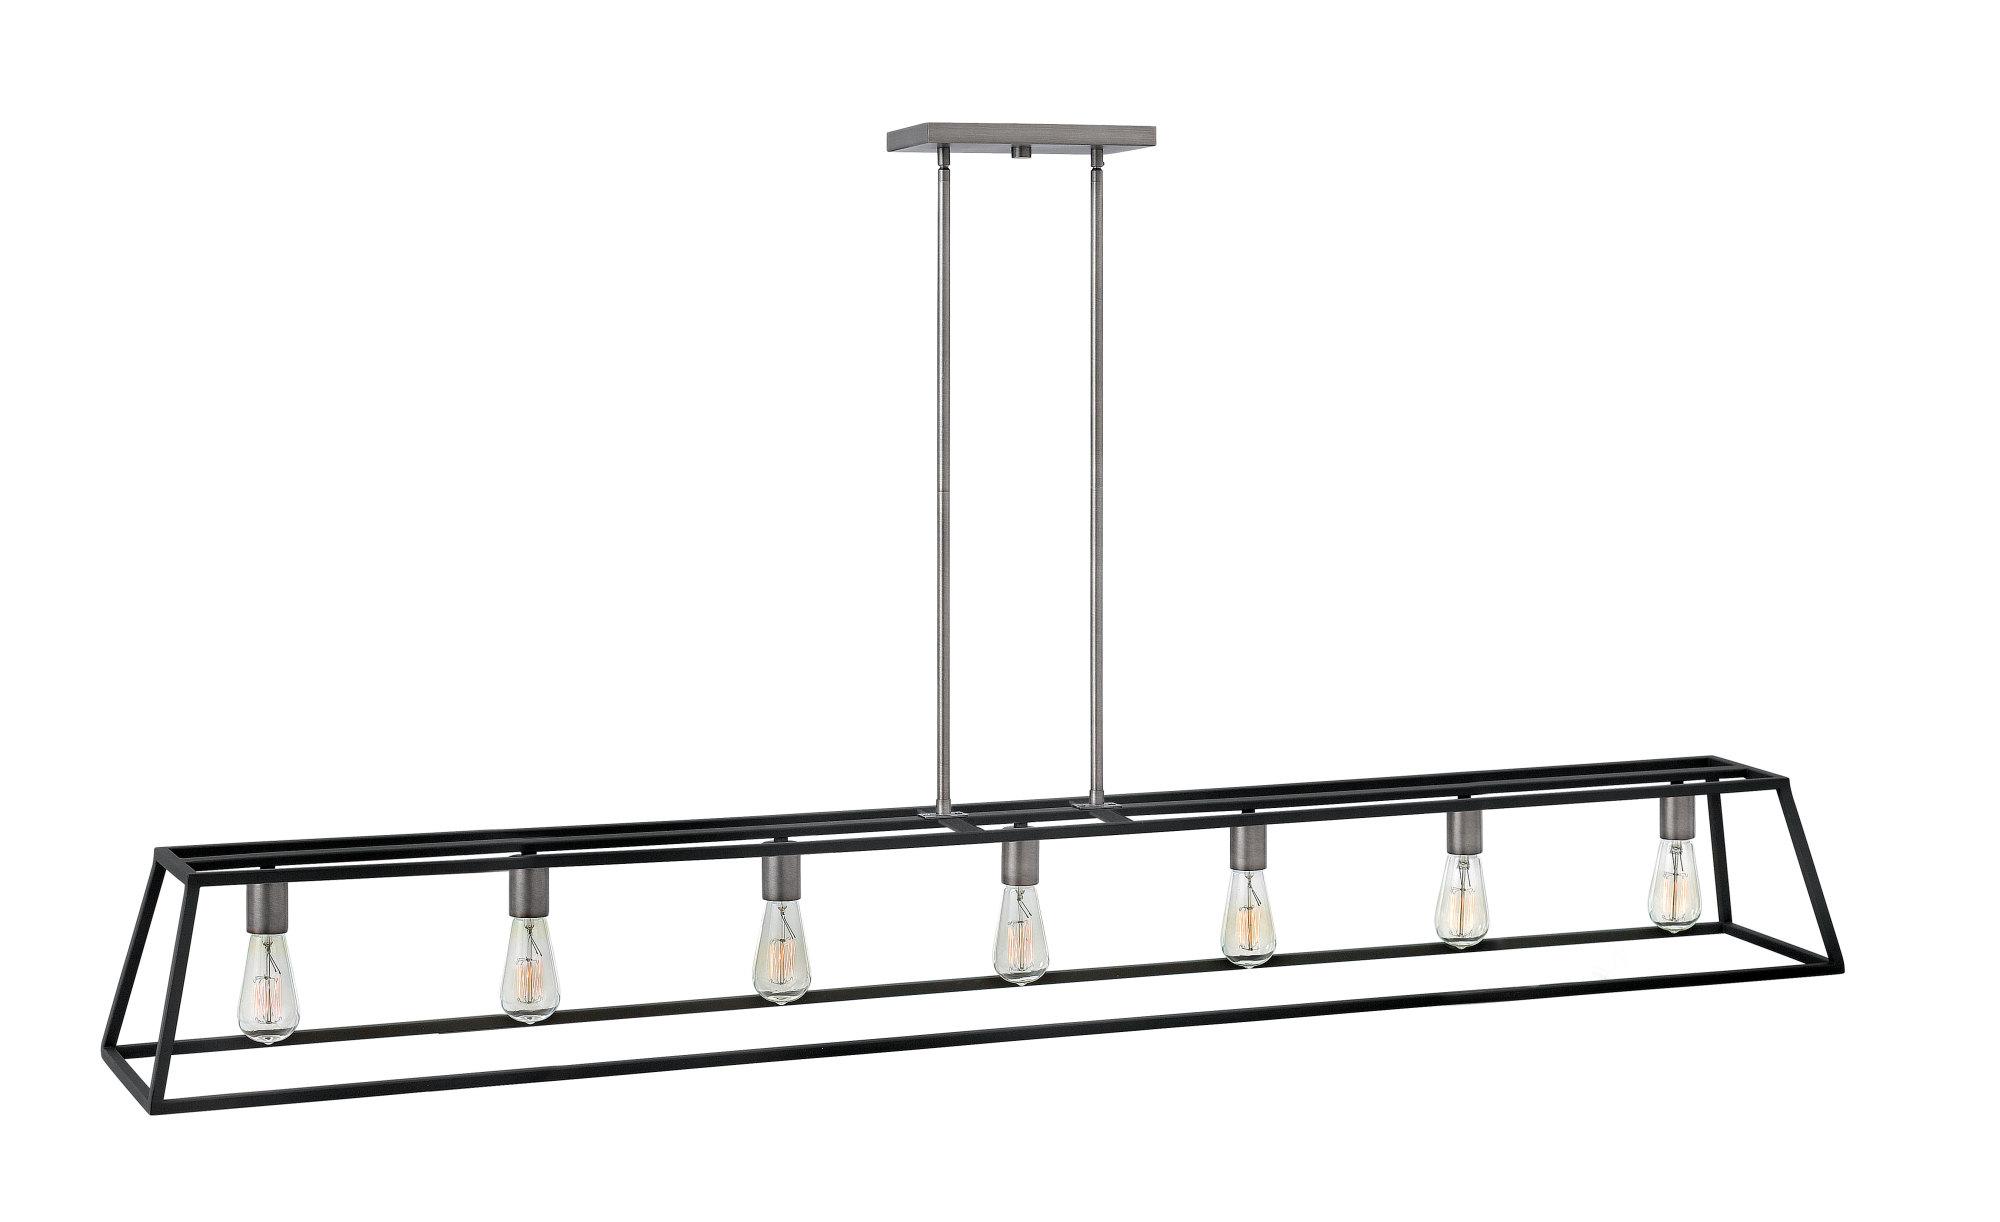 Hinkley Lighting 3355 7 Light 1 Tier Linear Chandelier